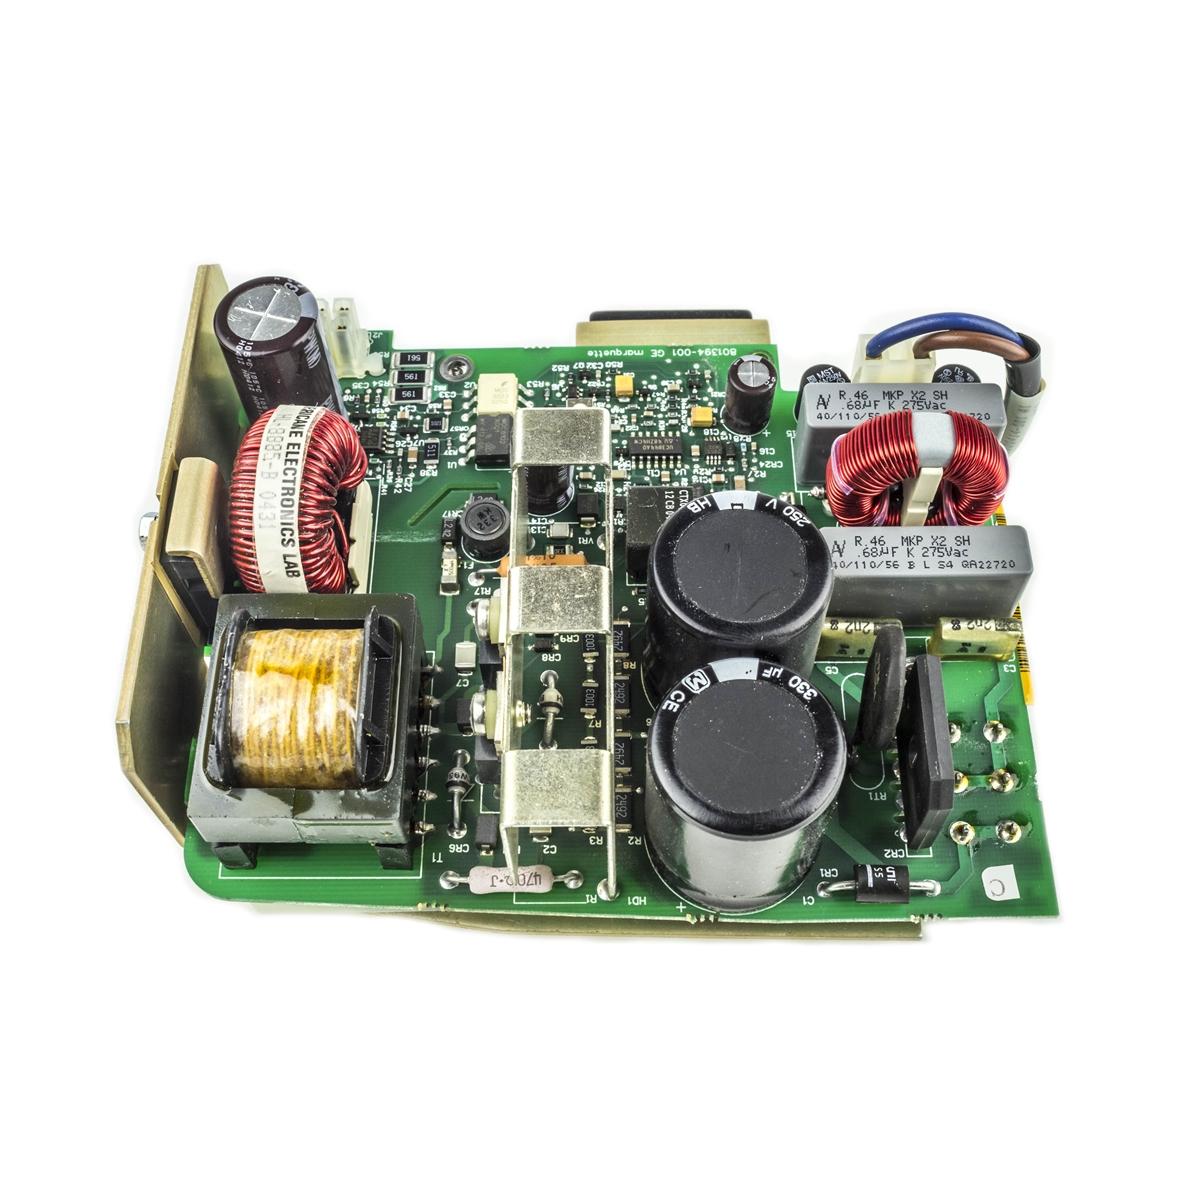 GE Dash 3000 4000 5000 Patient Monitor Power Supply Circuit Board & Ge Dash Schematic Diagram on